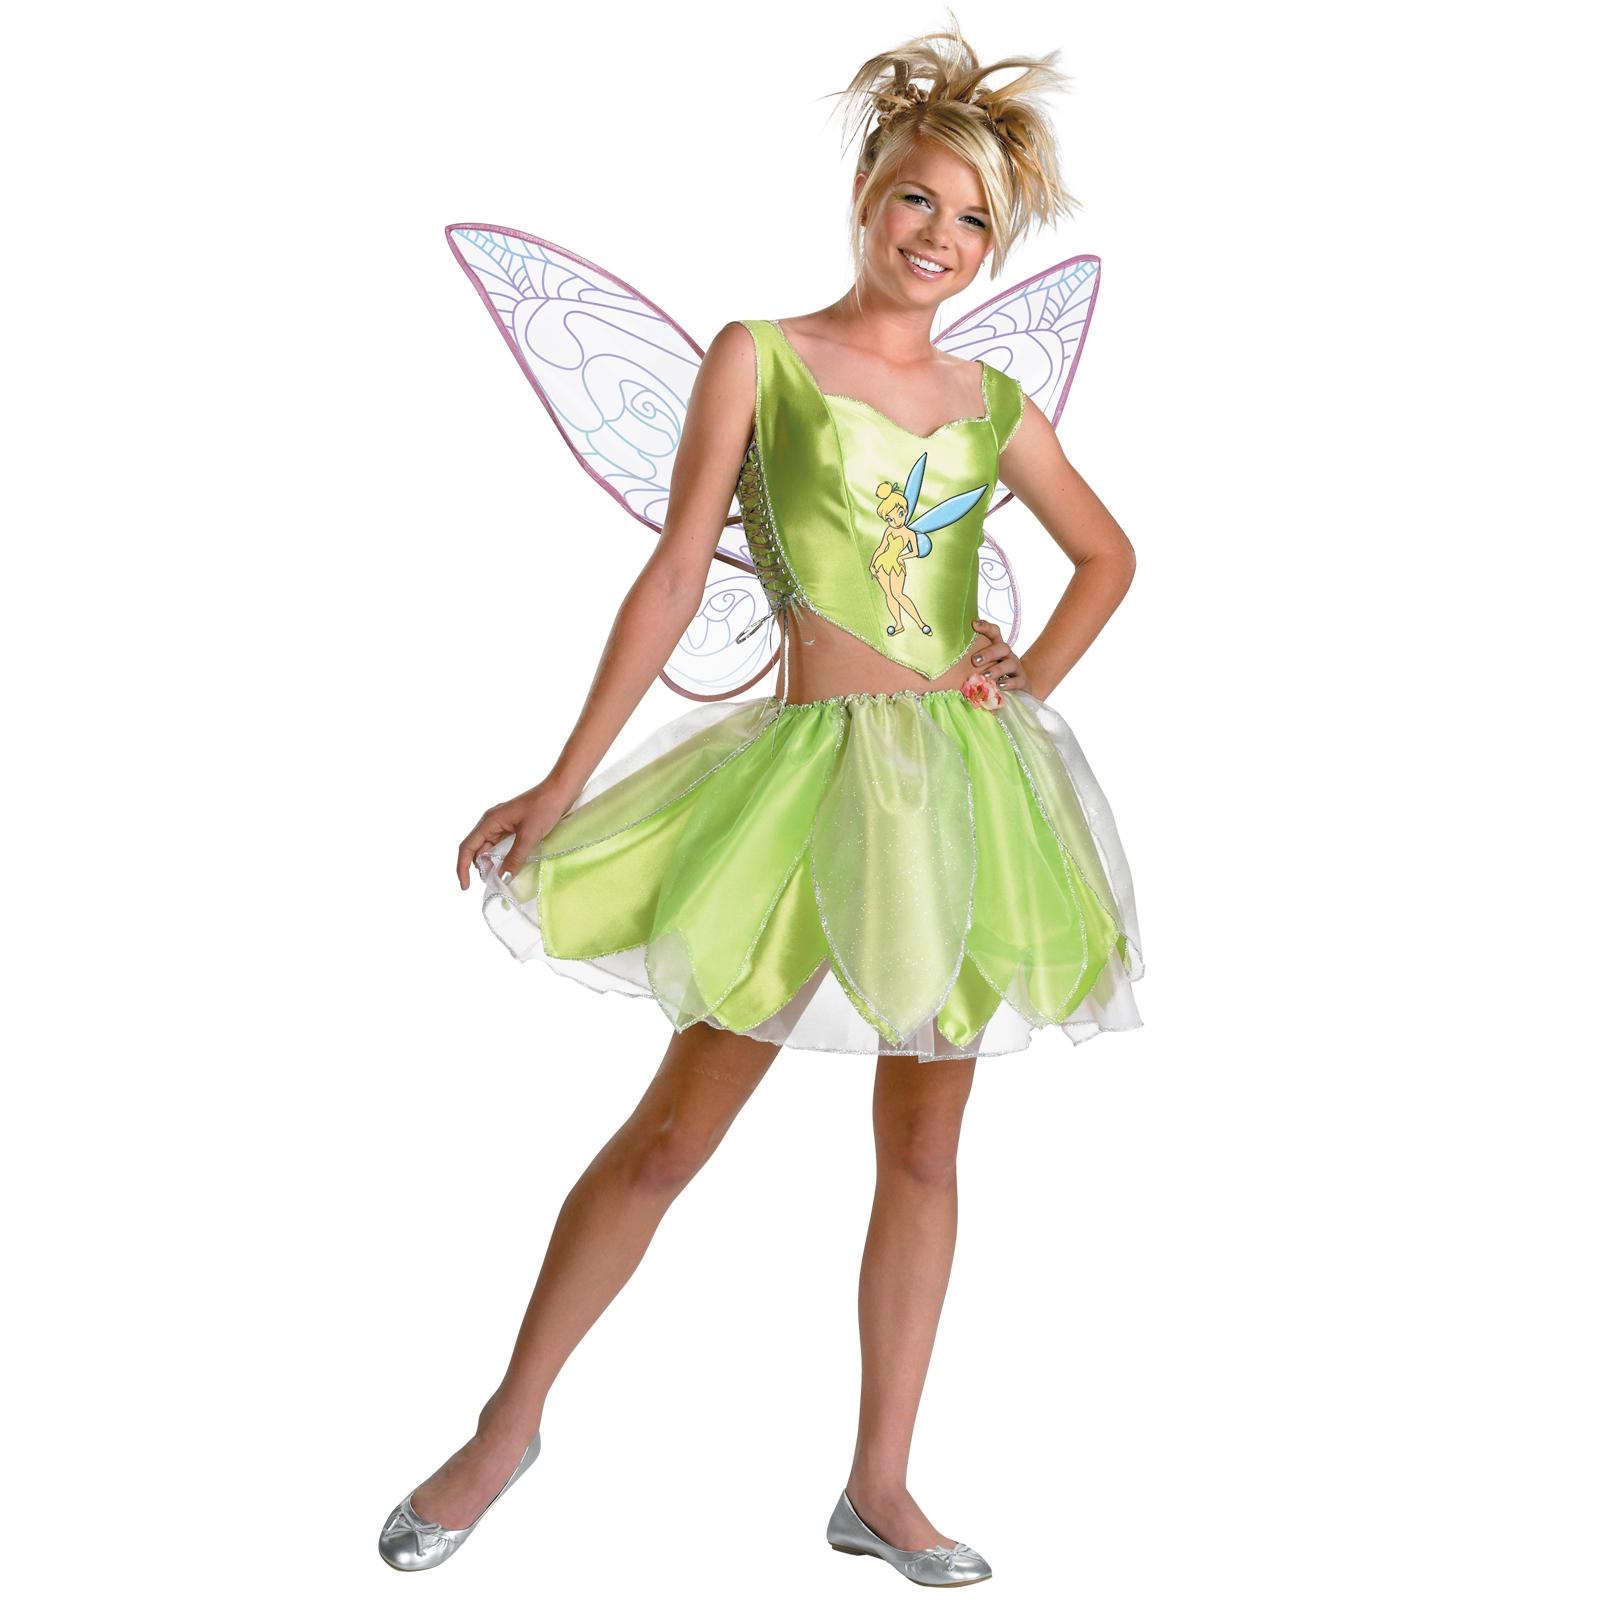 Tinkerbell costume sex pics sexy tube